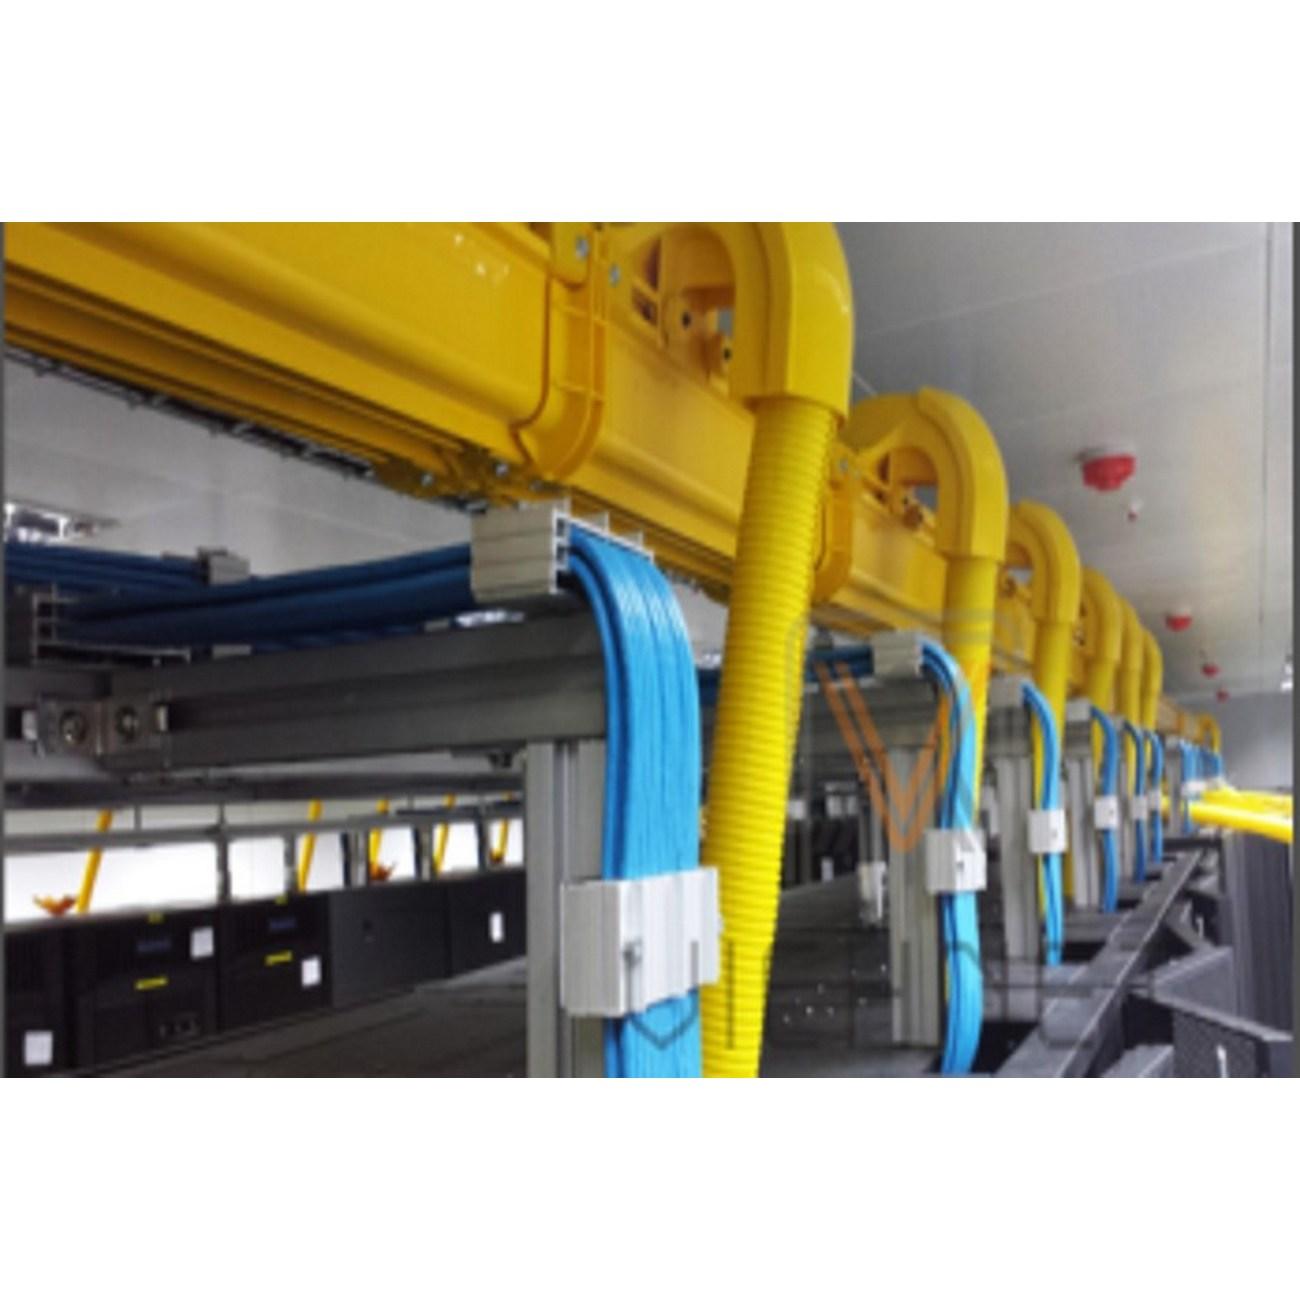 Fiber Optics & Structure Cabling (1)